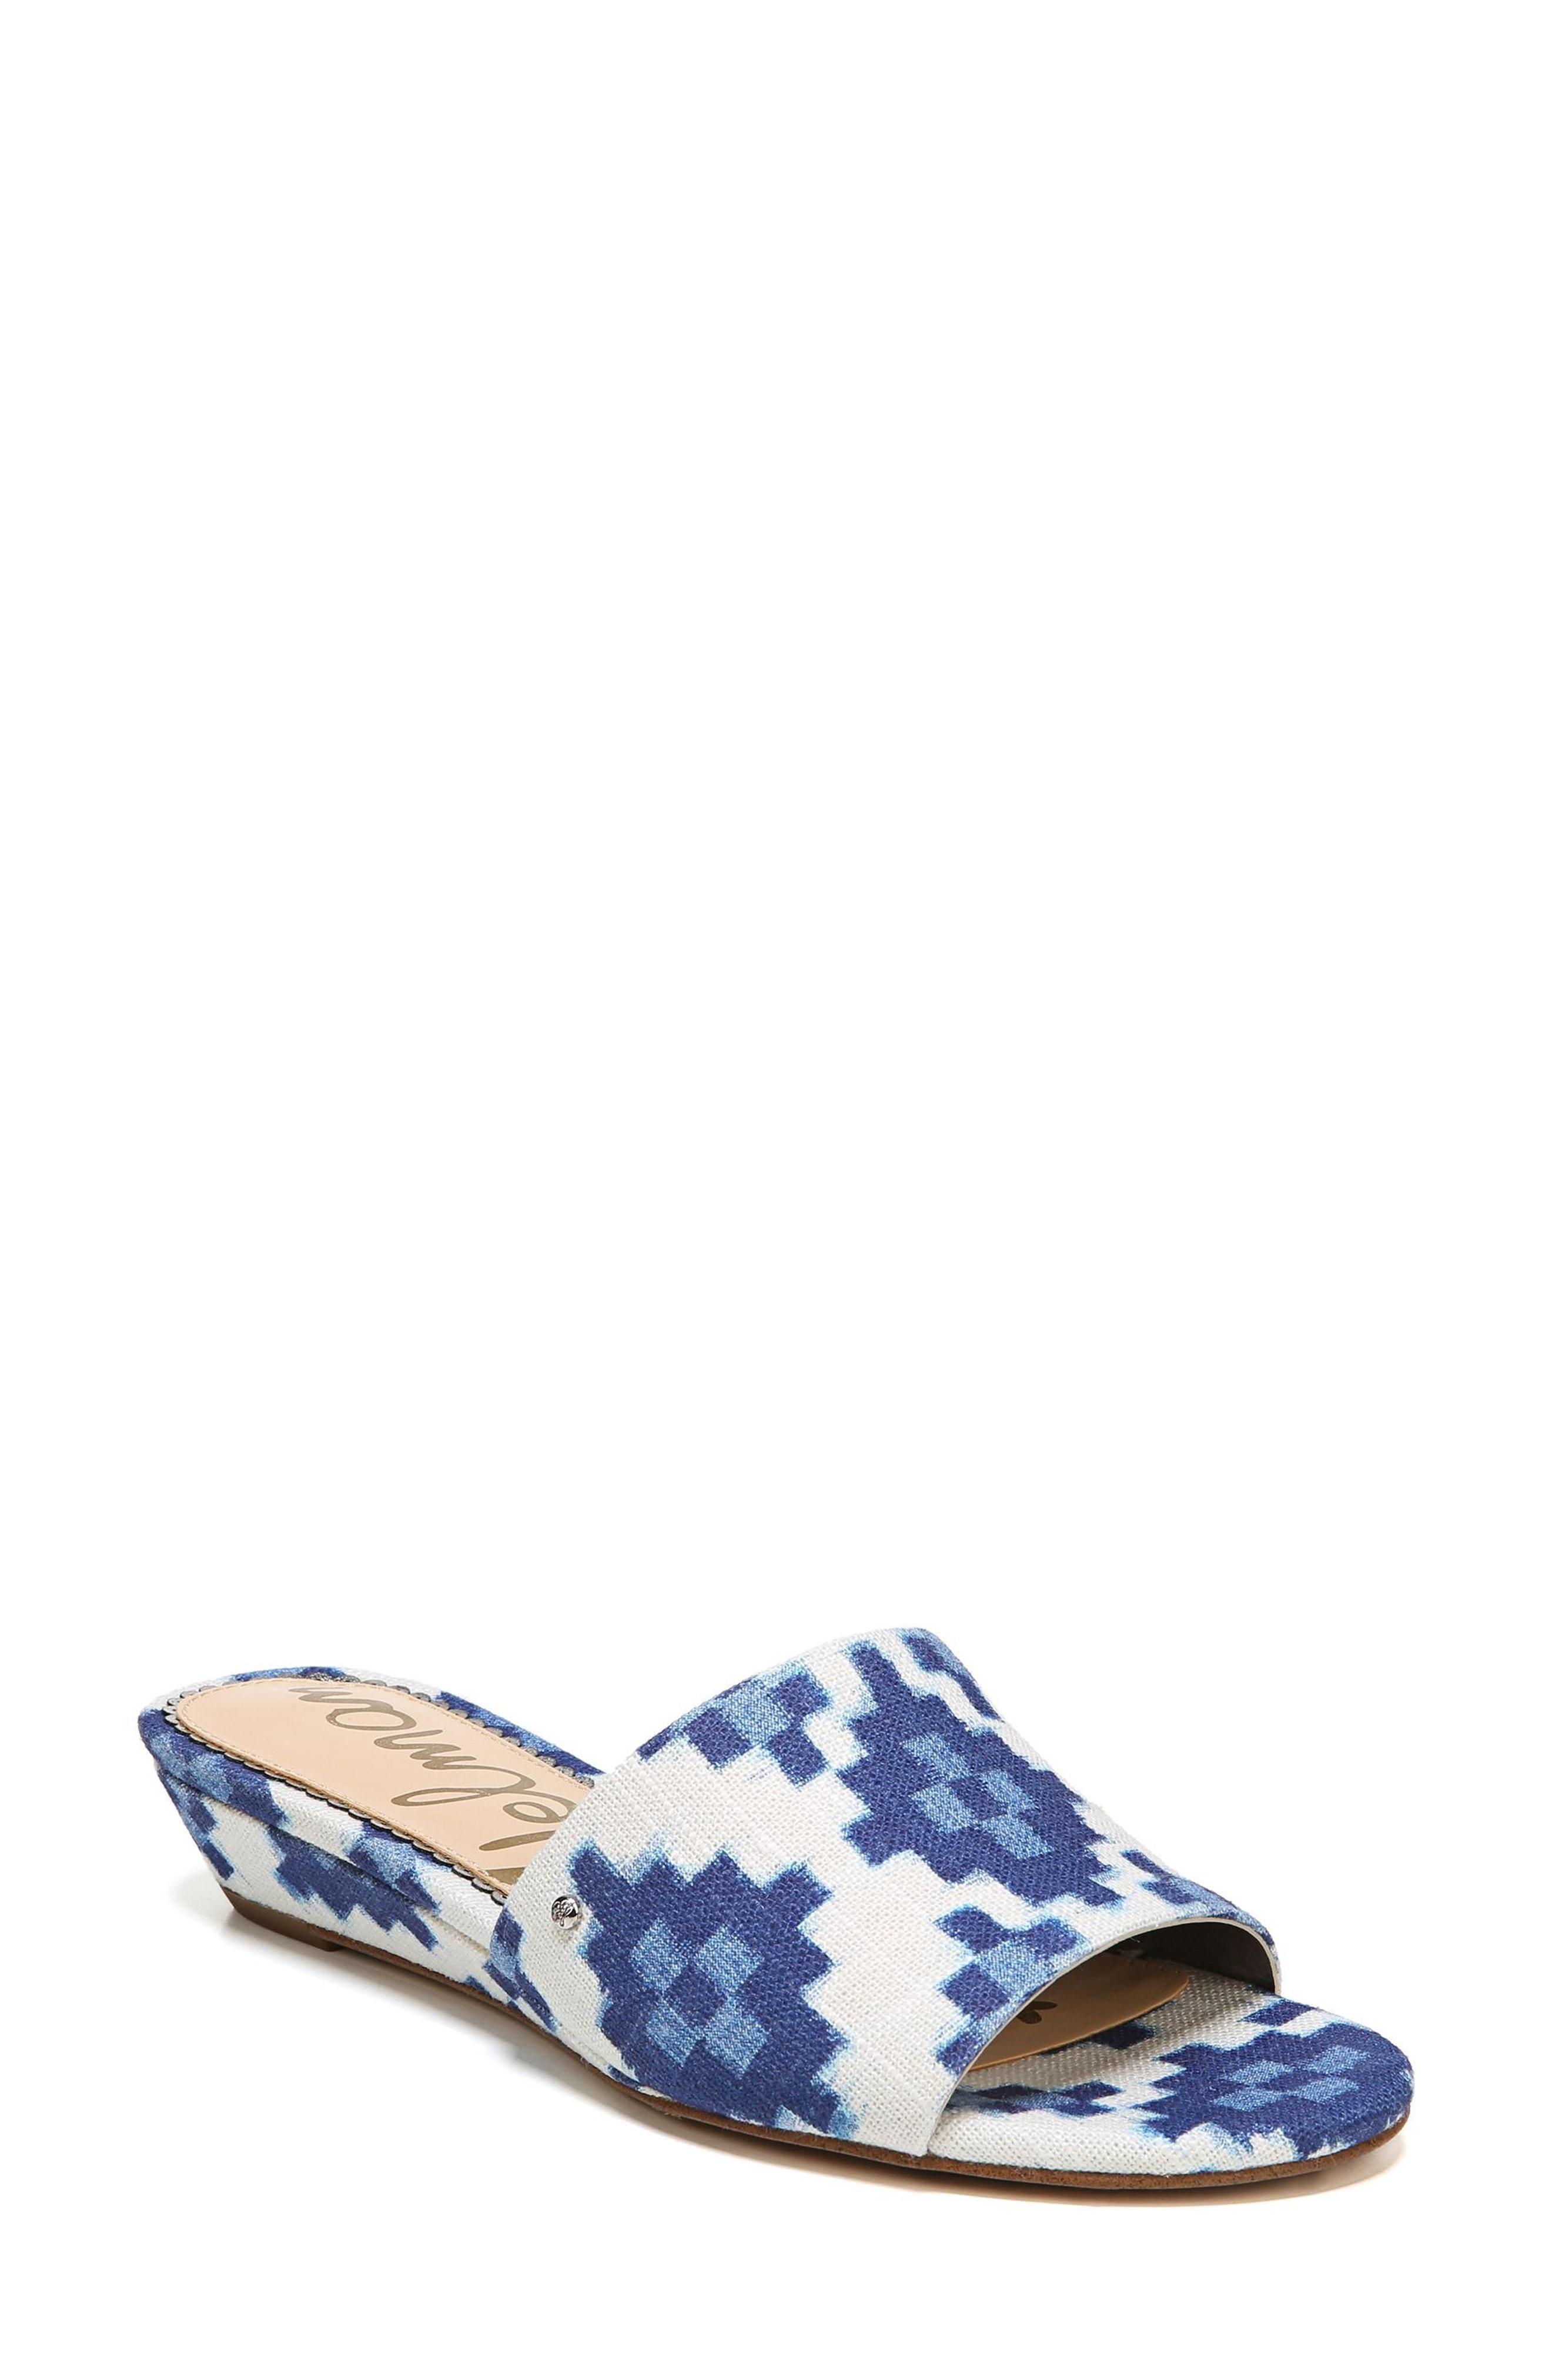 6f943afc8e3d Sam Edelman Liliana Slide Sandal In Blue Multi Print